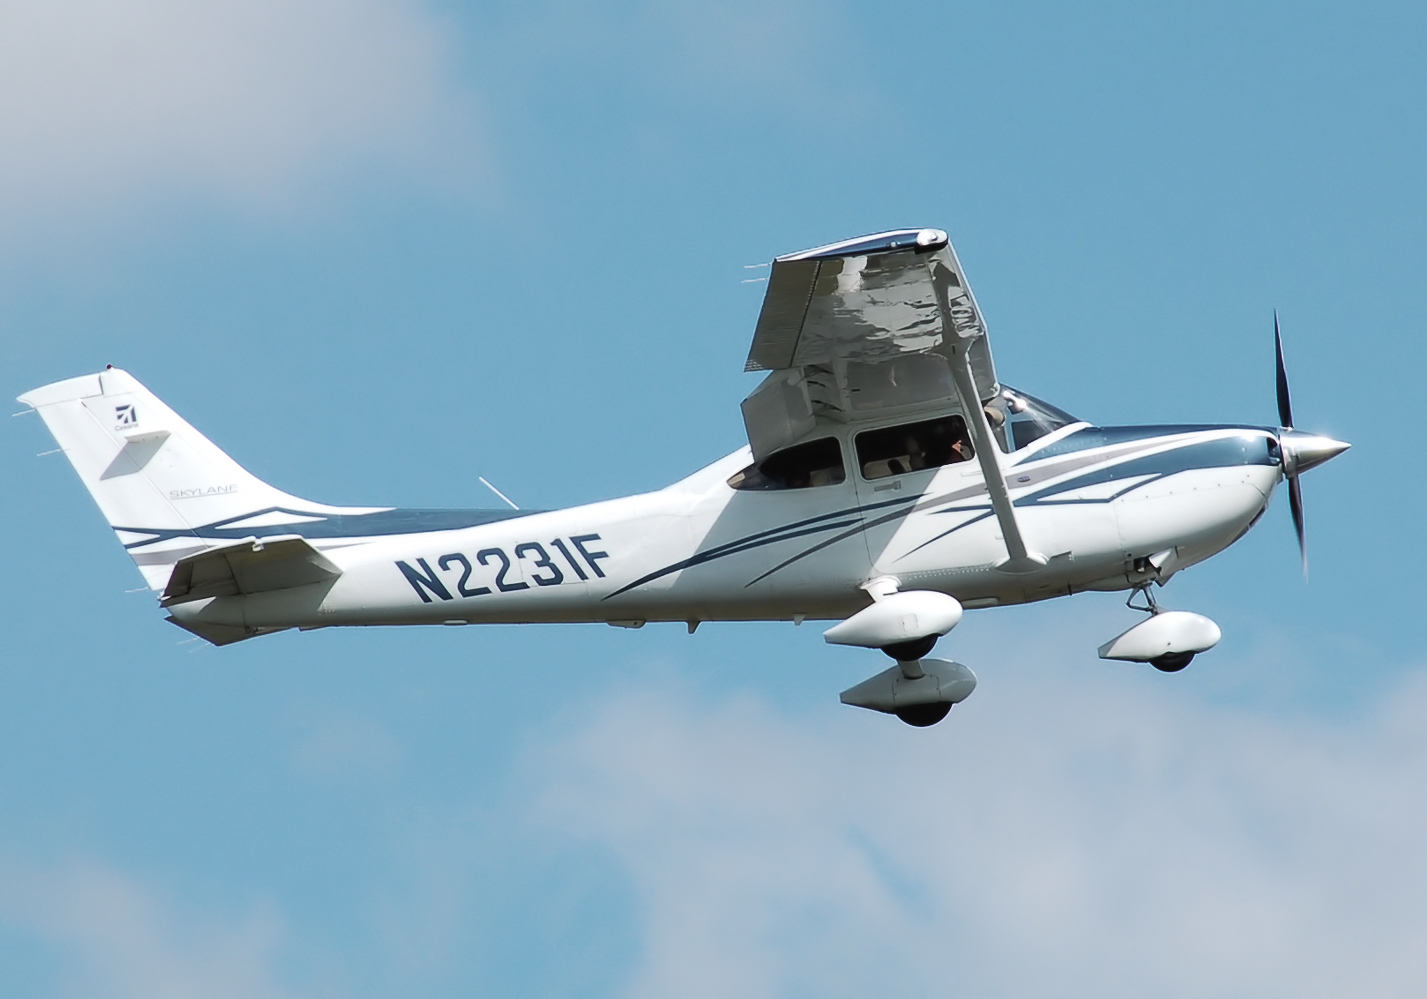 arizona plane crash, gilbert arizona, cause plane crash, crashes into house,number injuries,number fatalities